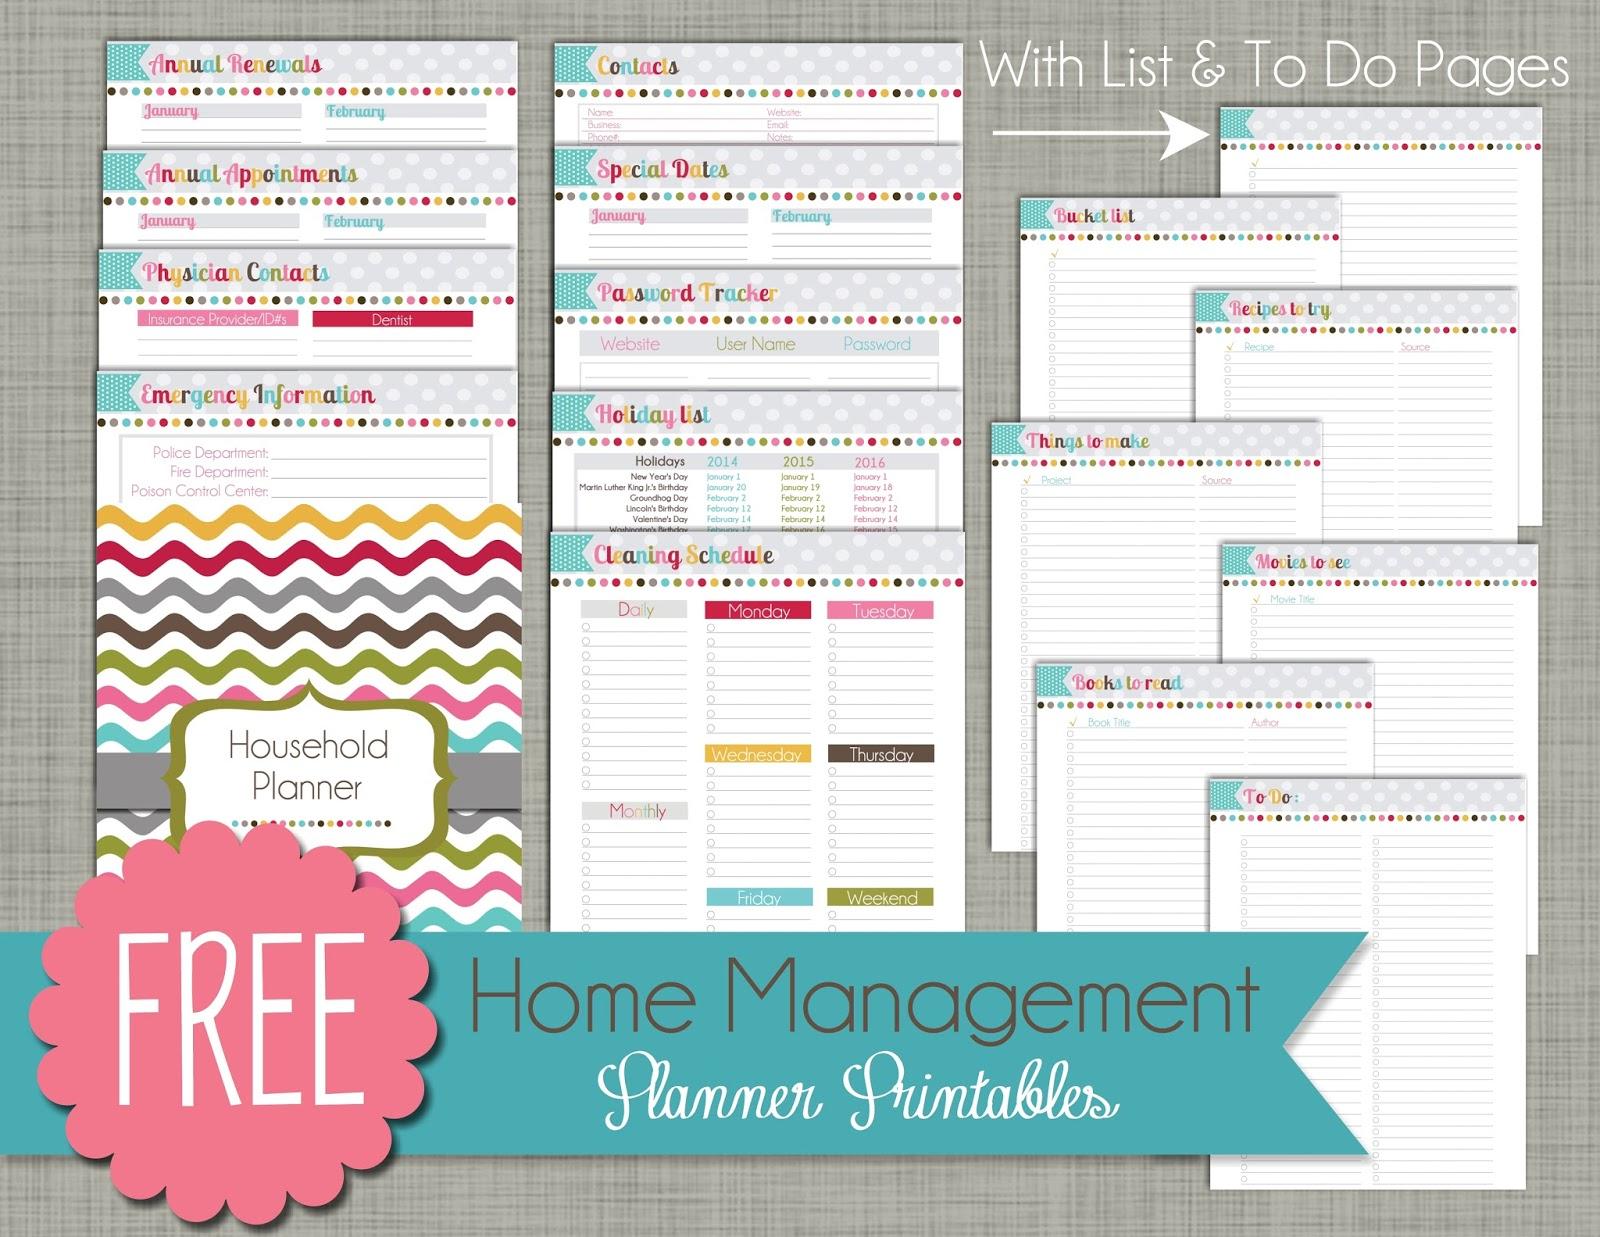 Free Printable Home Organizer Notebook | Download Them Or Print - Free Printable Home Organizer Notebook